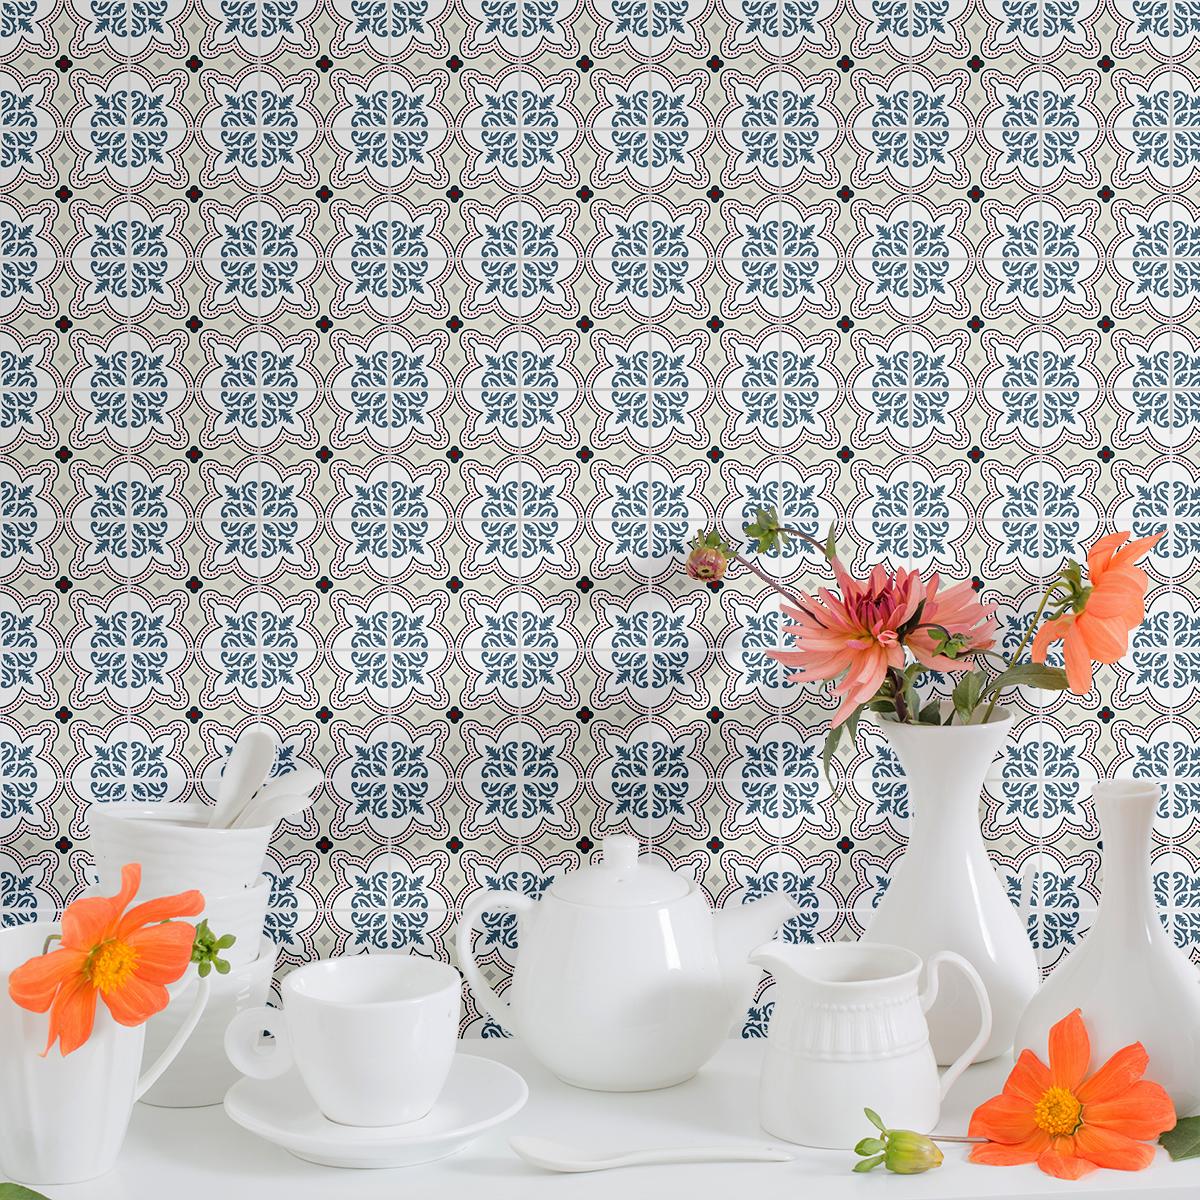 9 stickers carreaux de ciment azulejos amadis cuisine. Black Bedroom Furniture Sets. Home Design Ideas